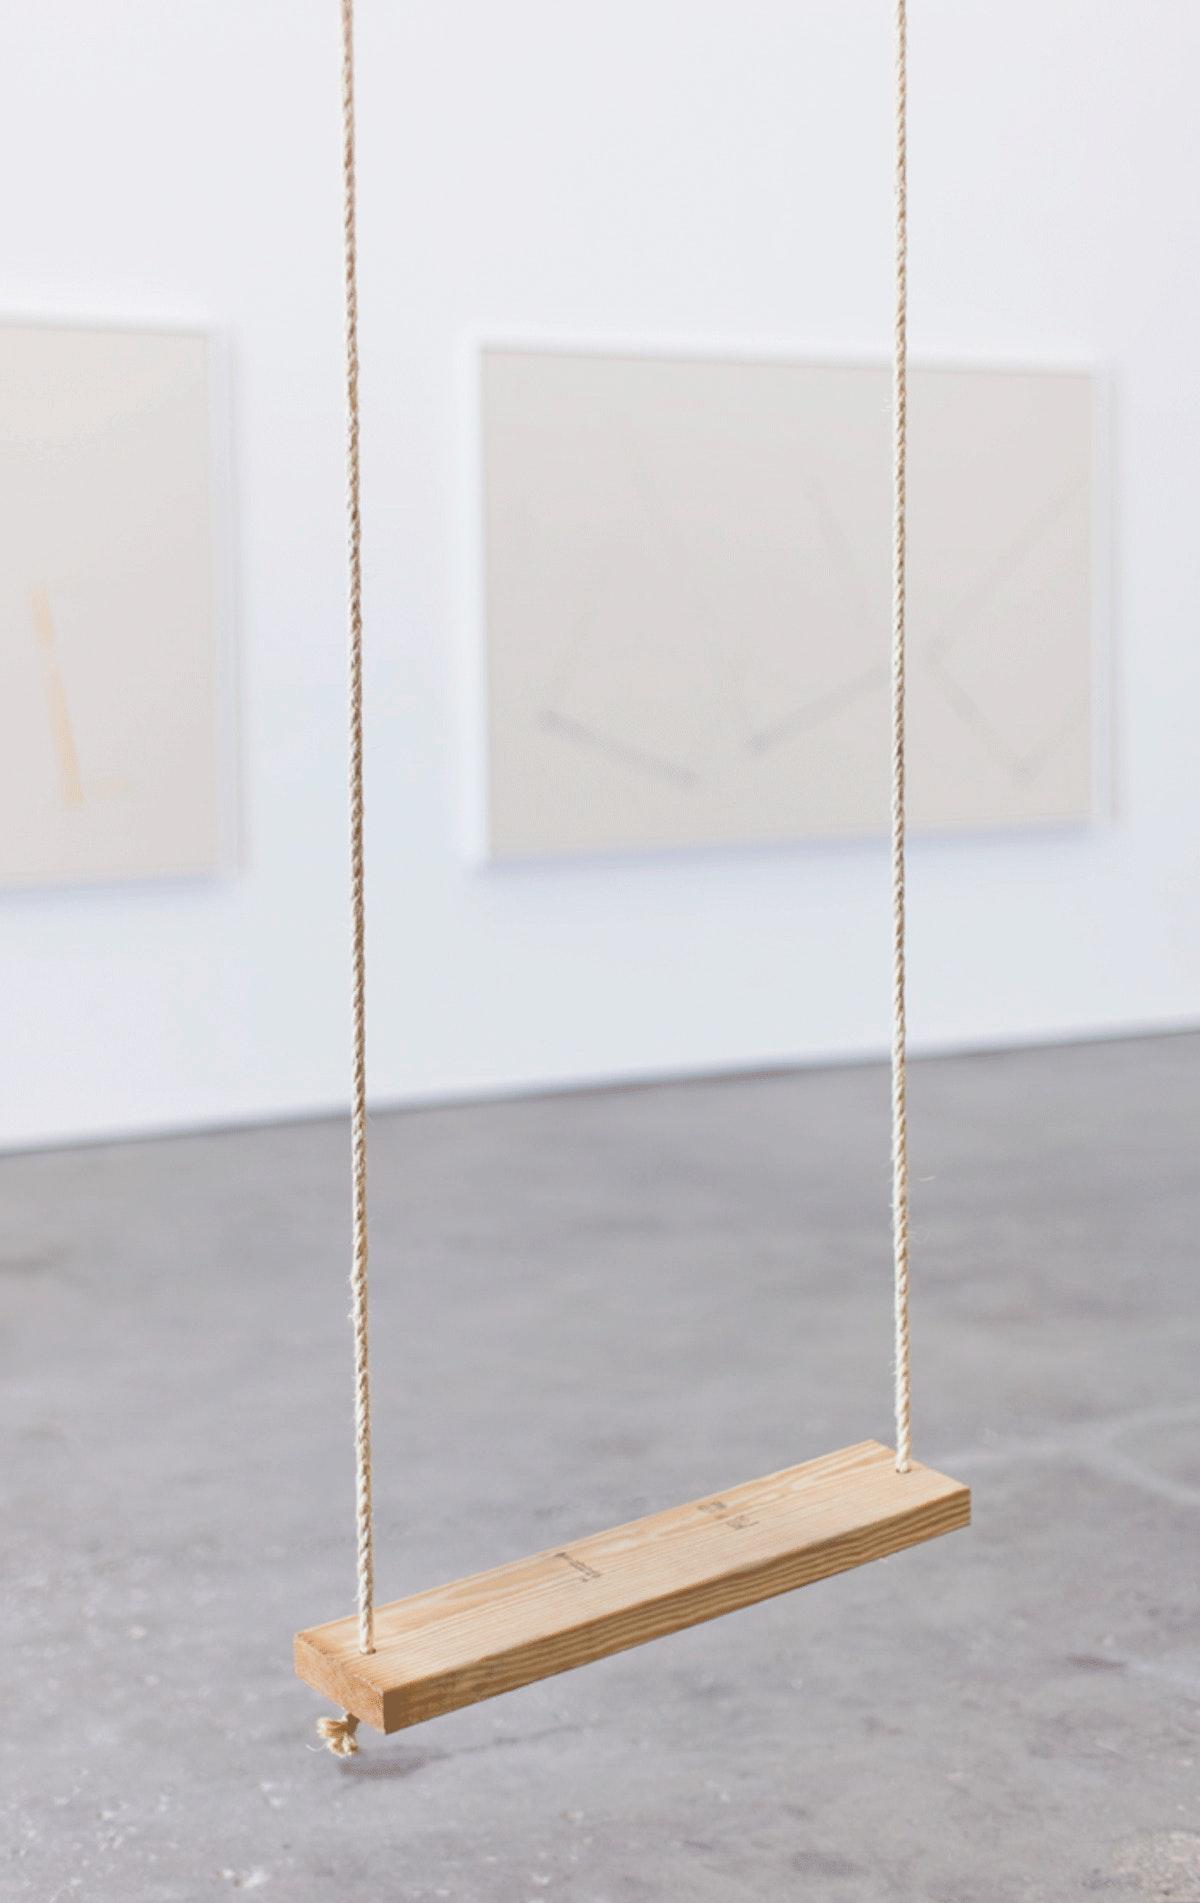 Bill Brady Gallery